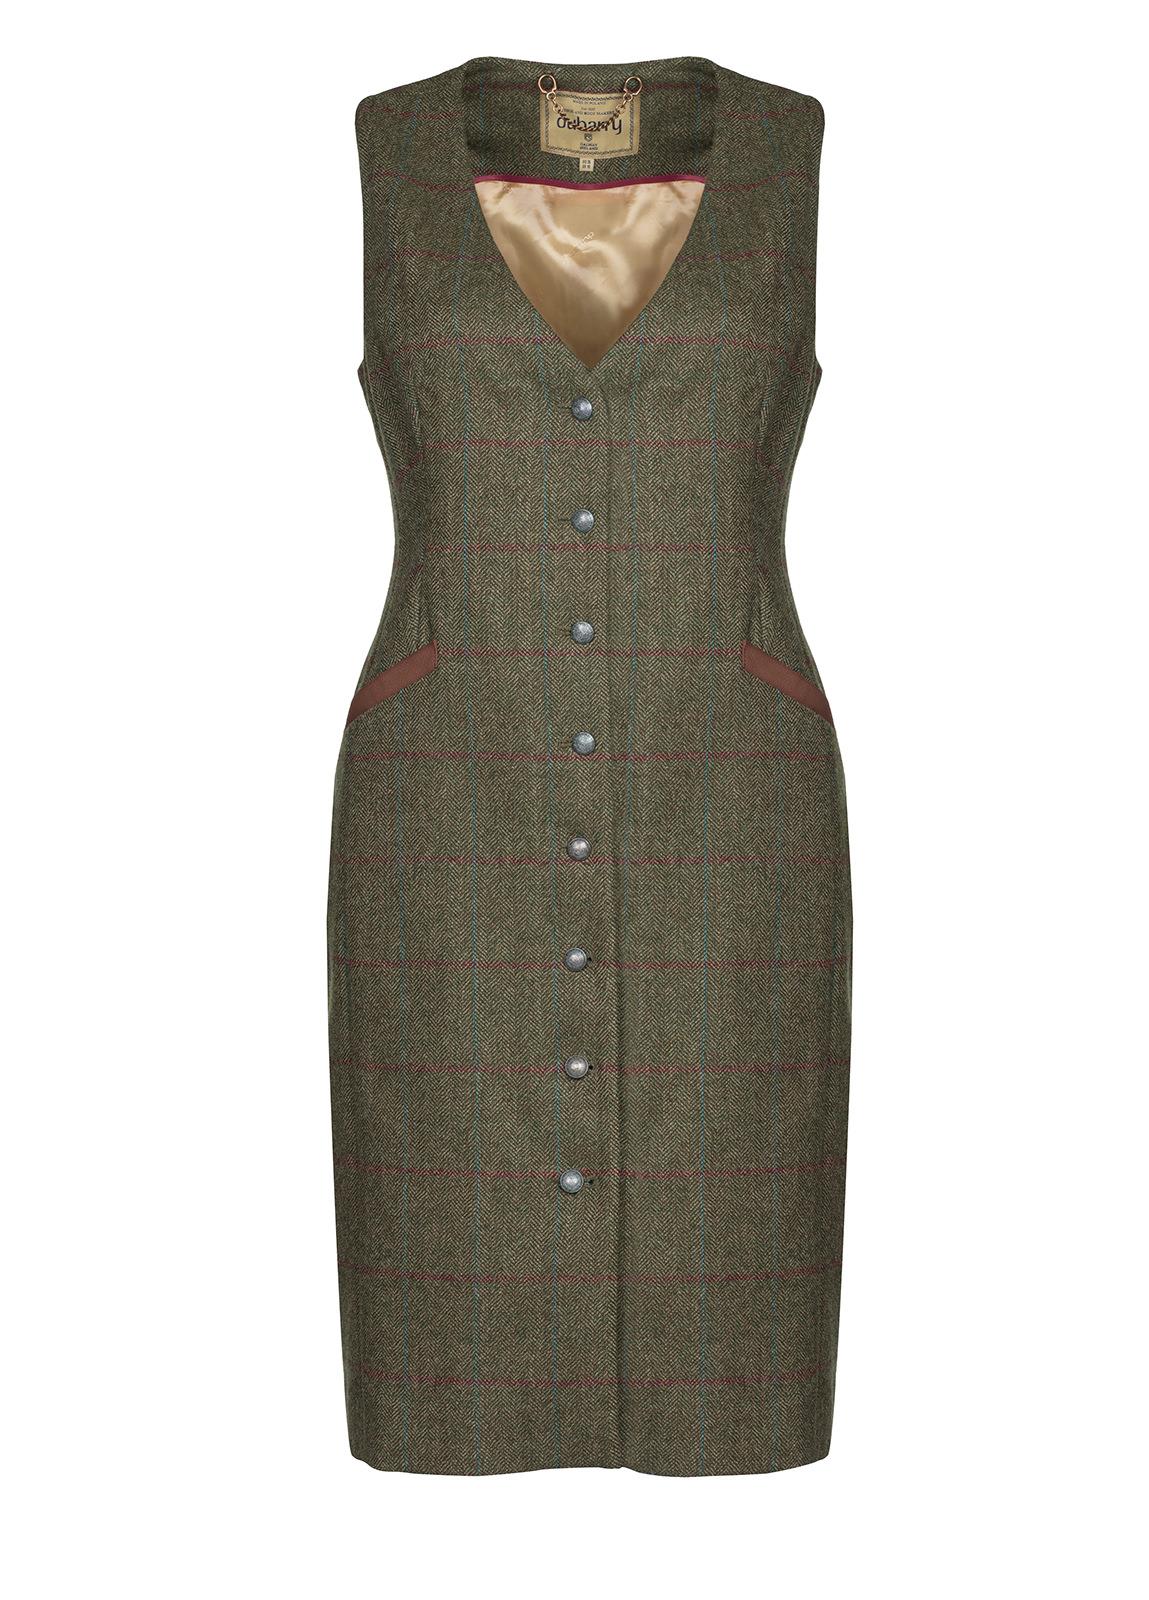 Dubarry_ Larkhill Tweed dress - Moss_Image_2